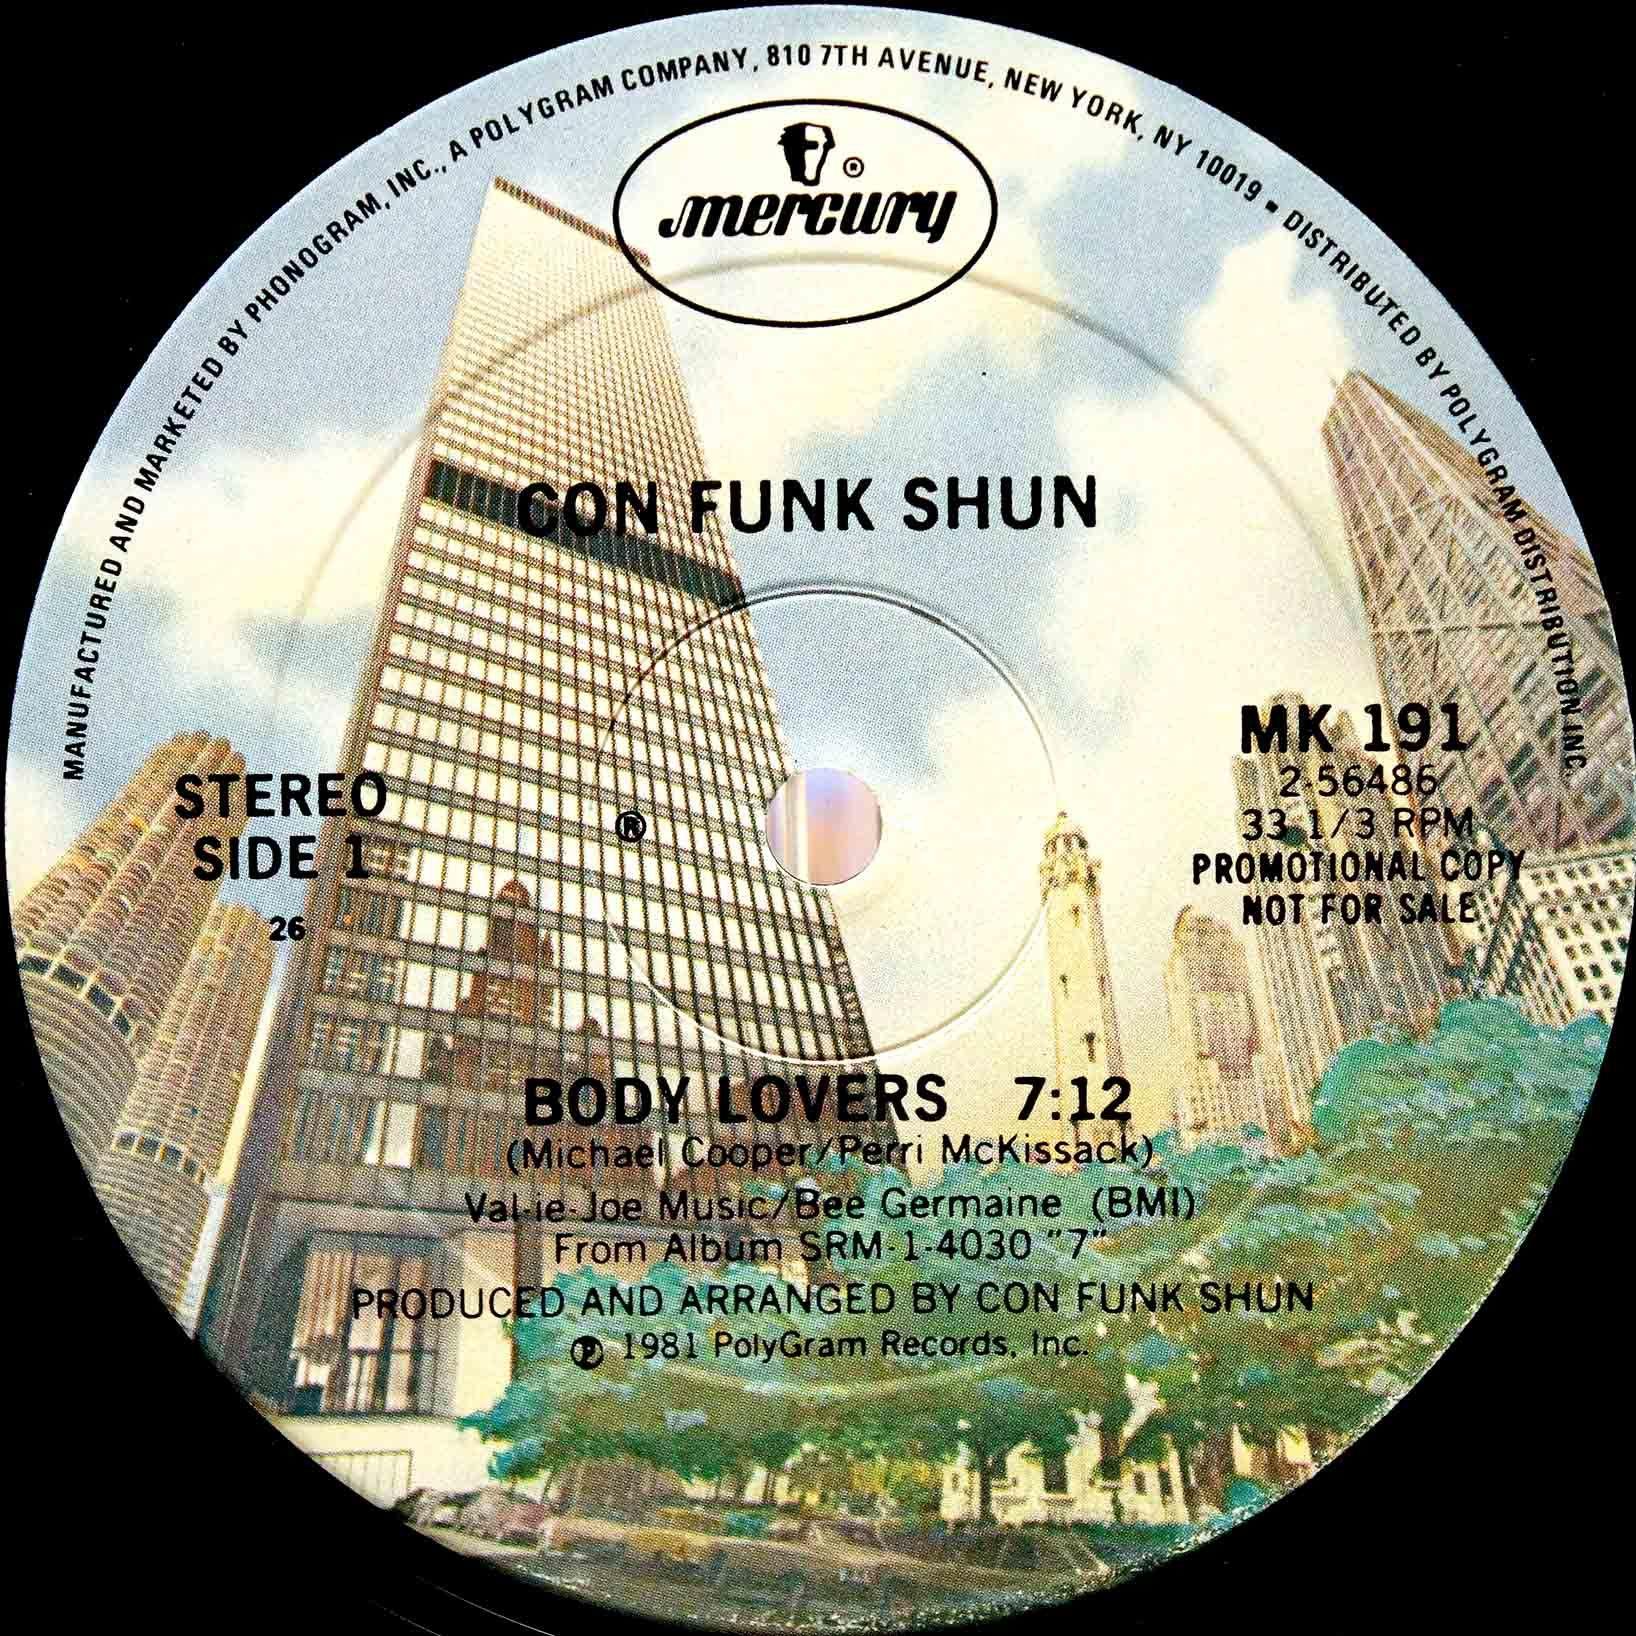 Con Funk Shun – Body Lovers 02